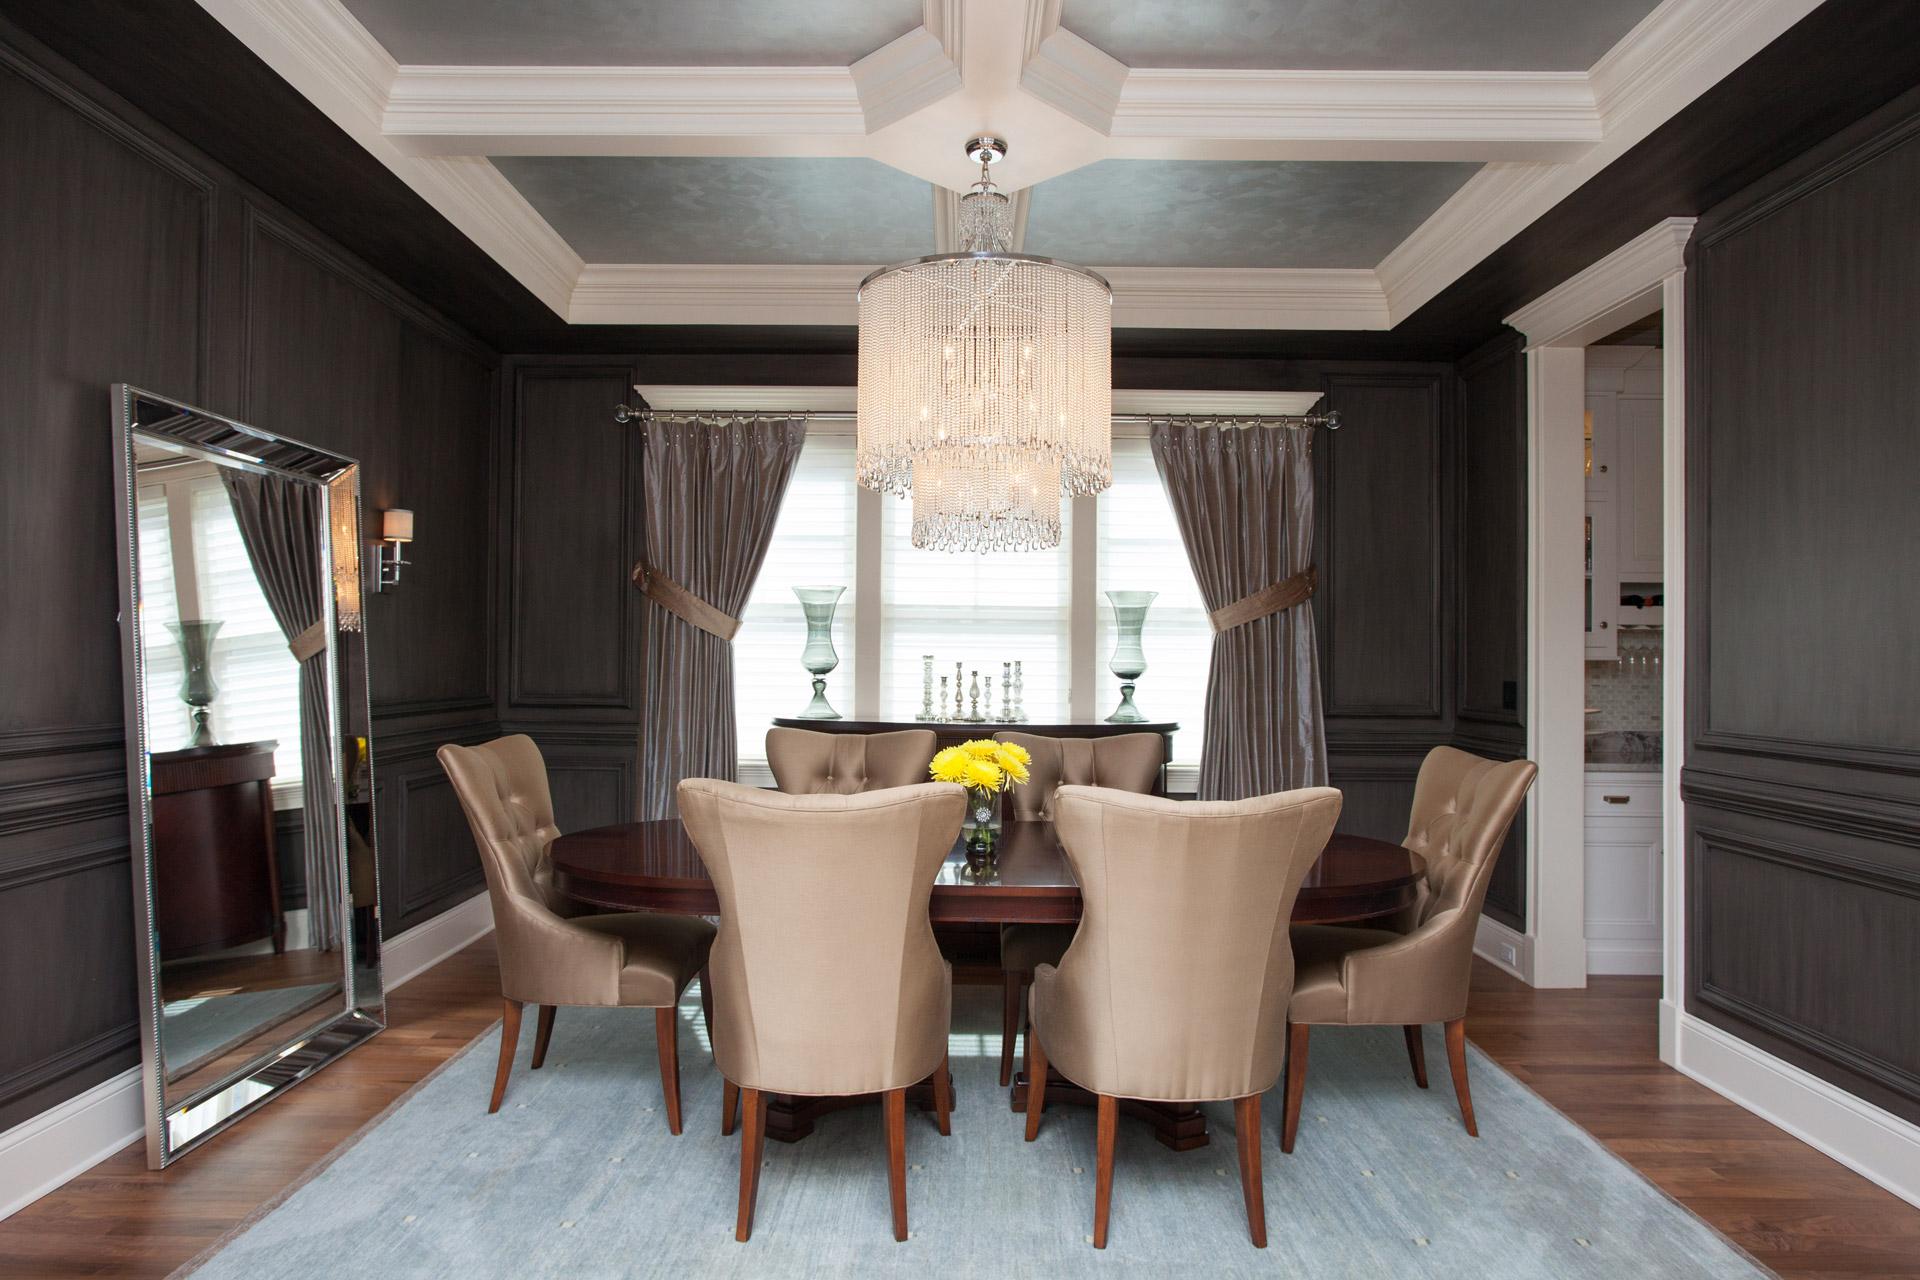 Dining room interior photos Naperville